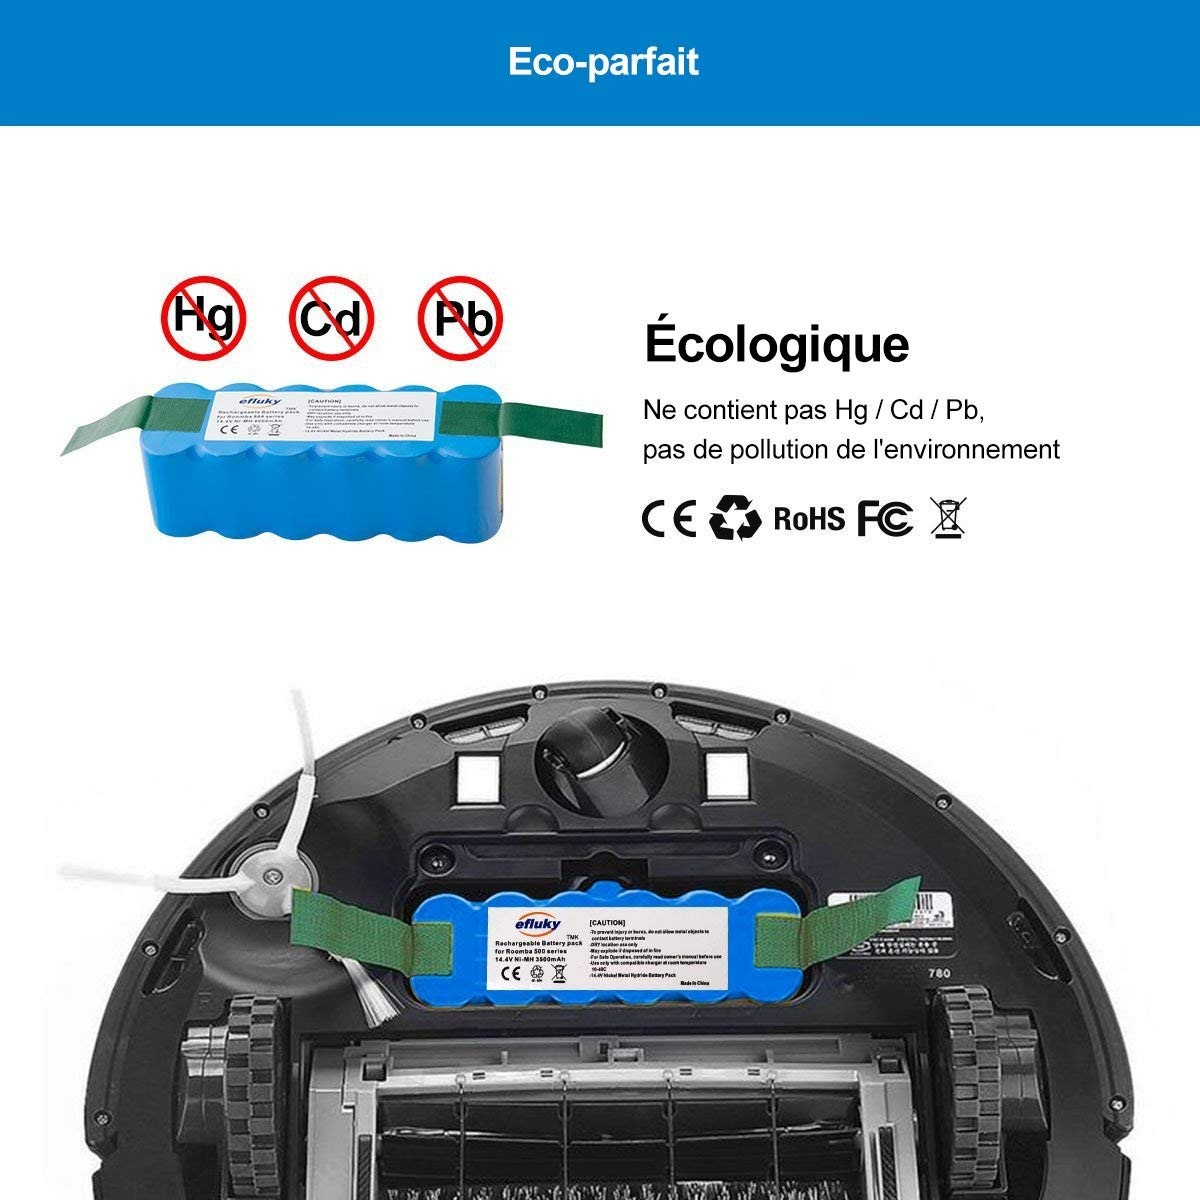 efluky 4.0Ah batería de Repuesto para irobot roomba + Kit cepillos repuestos de Accesorios para iRobot Roomba Serie 600 -un Conjunto DE 11